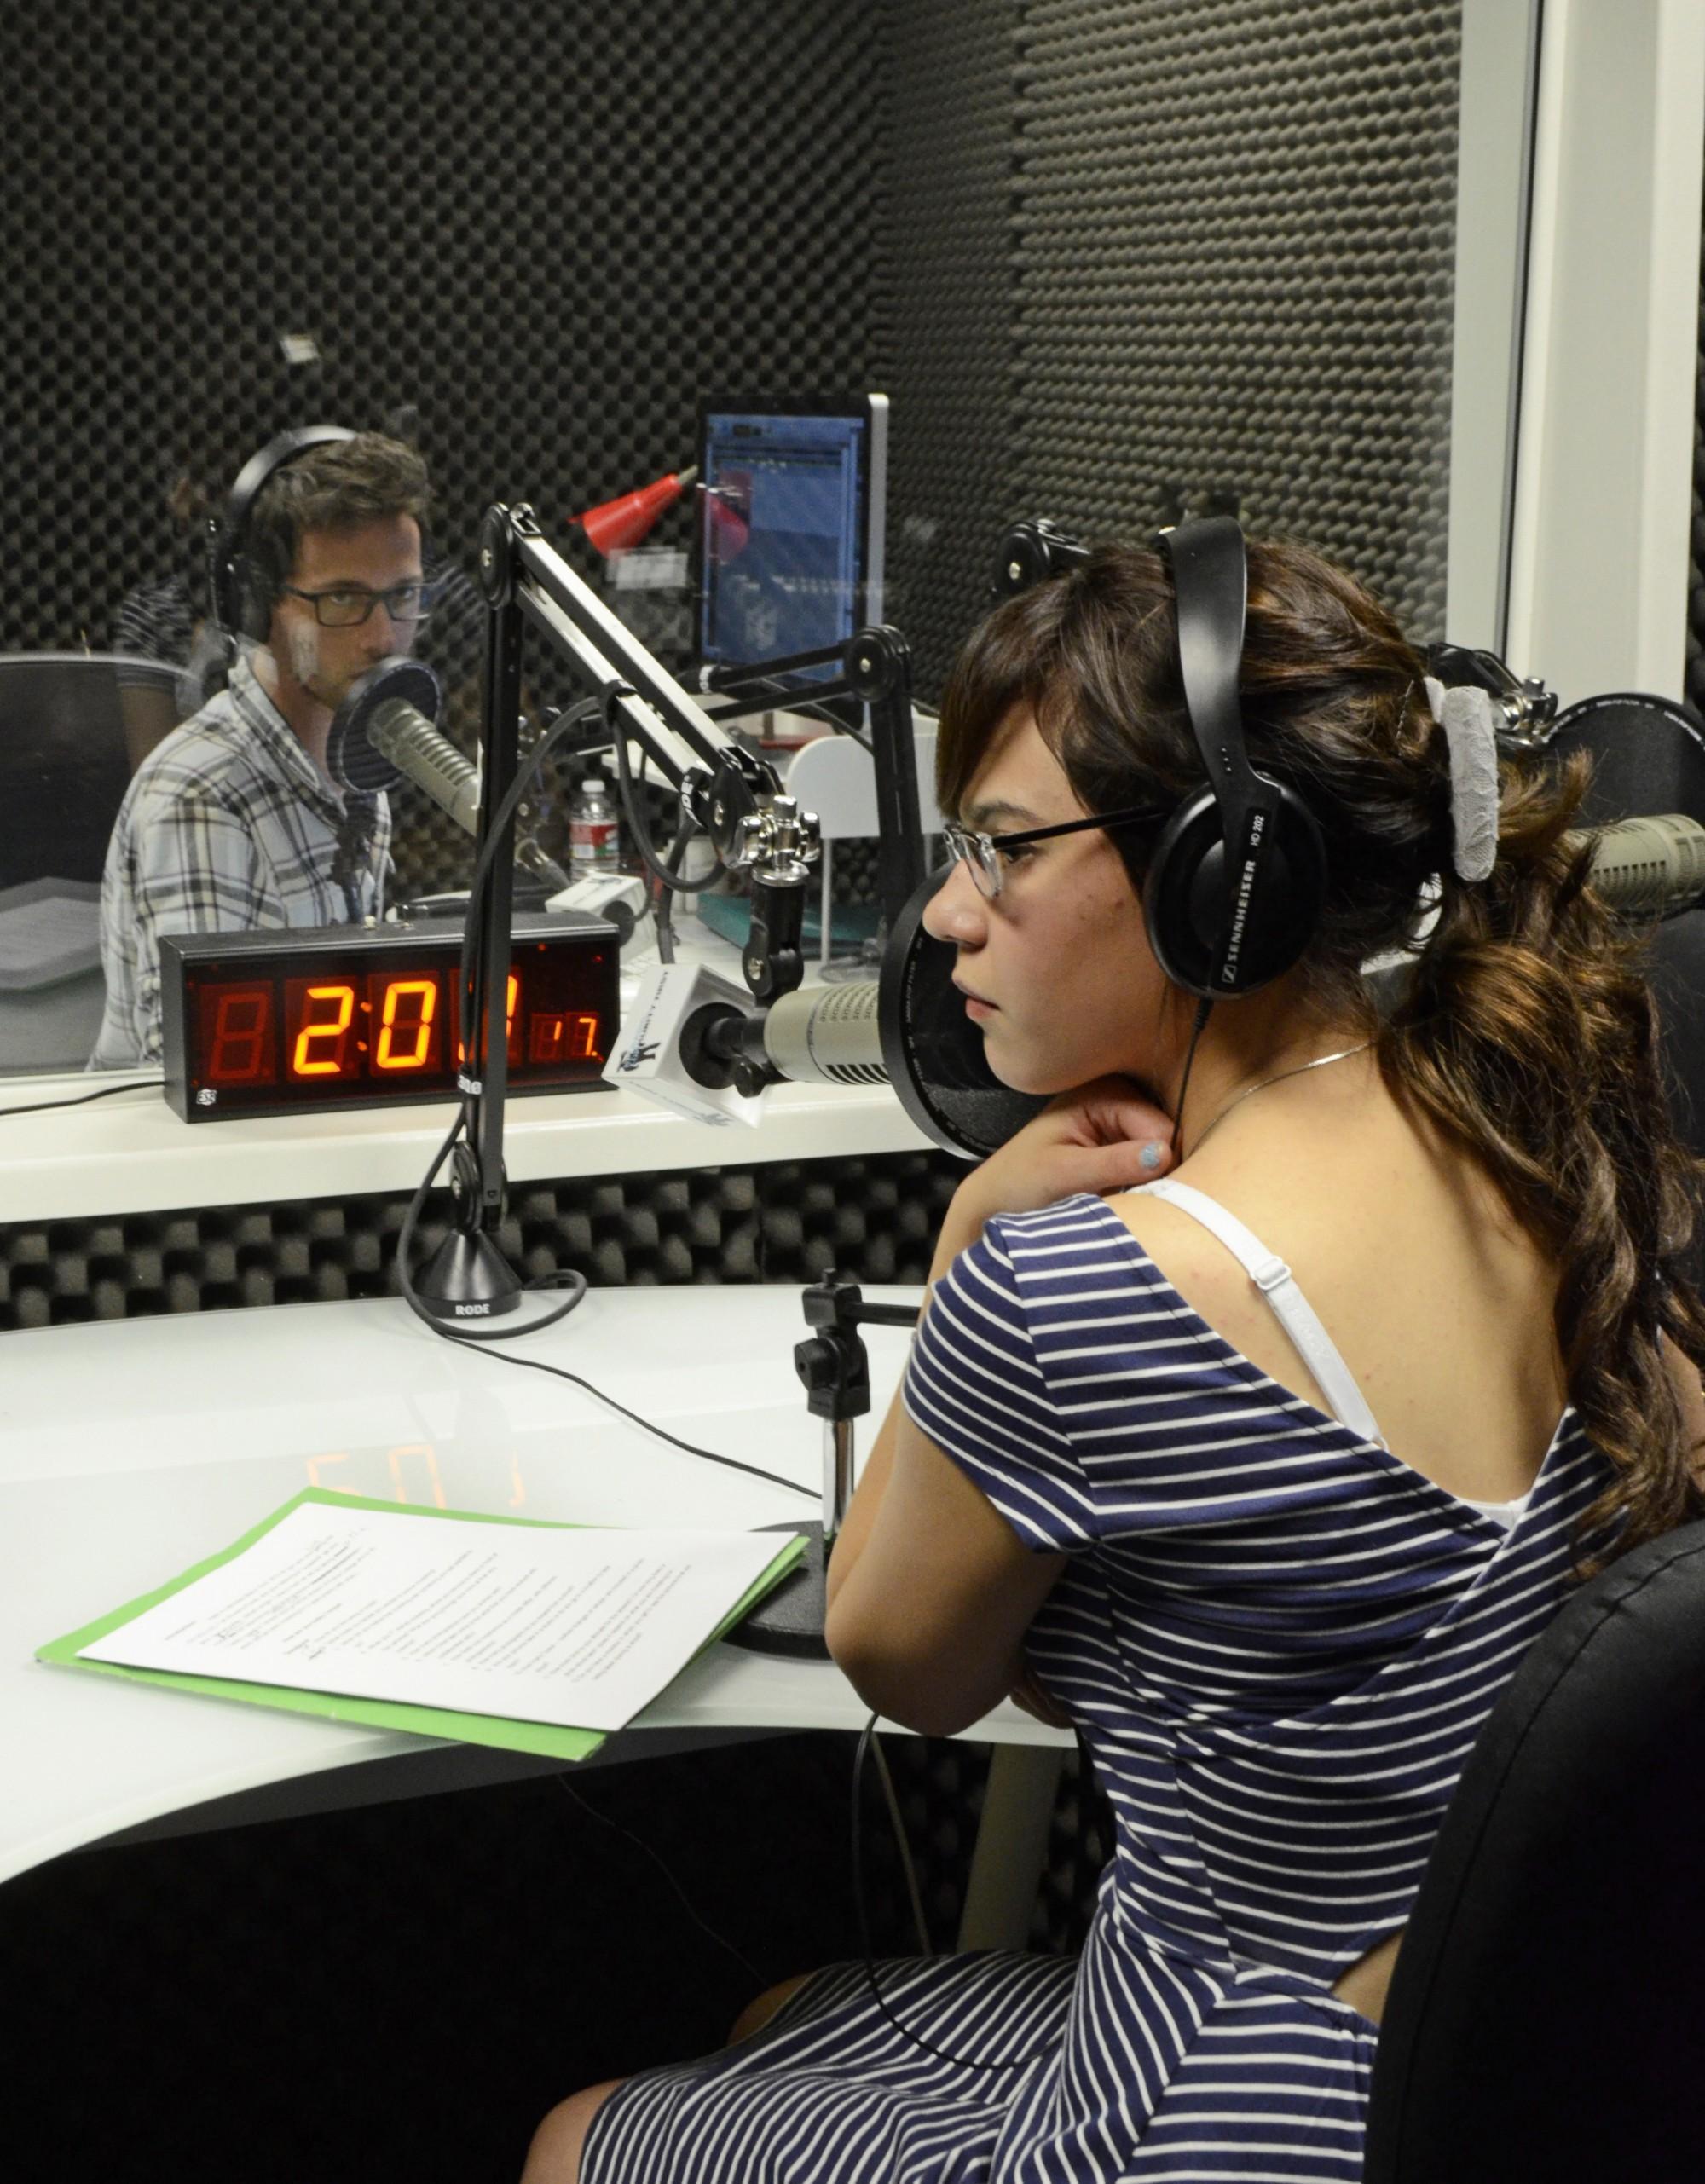 PHOTO ESSAY: Inside KPCRadio.com Radio Studio